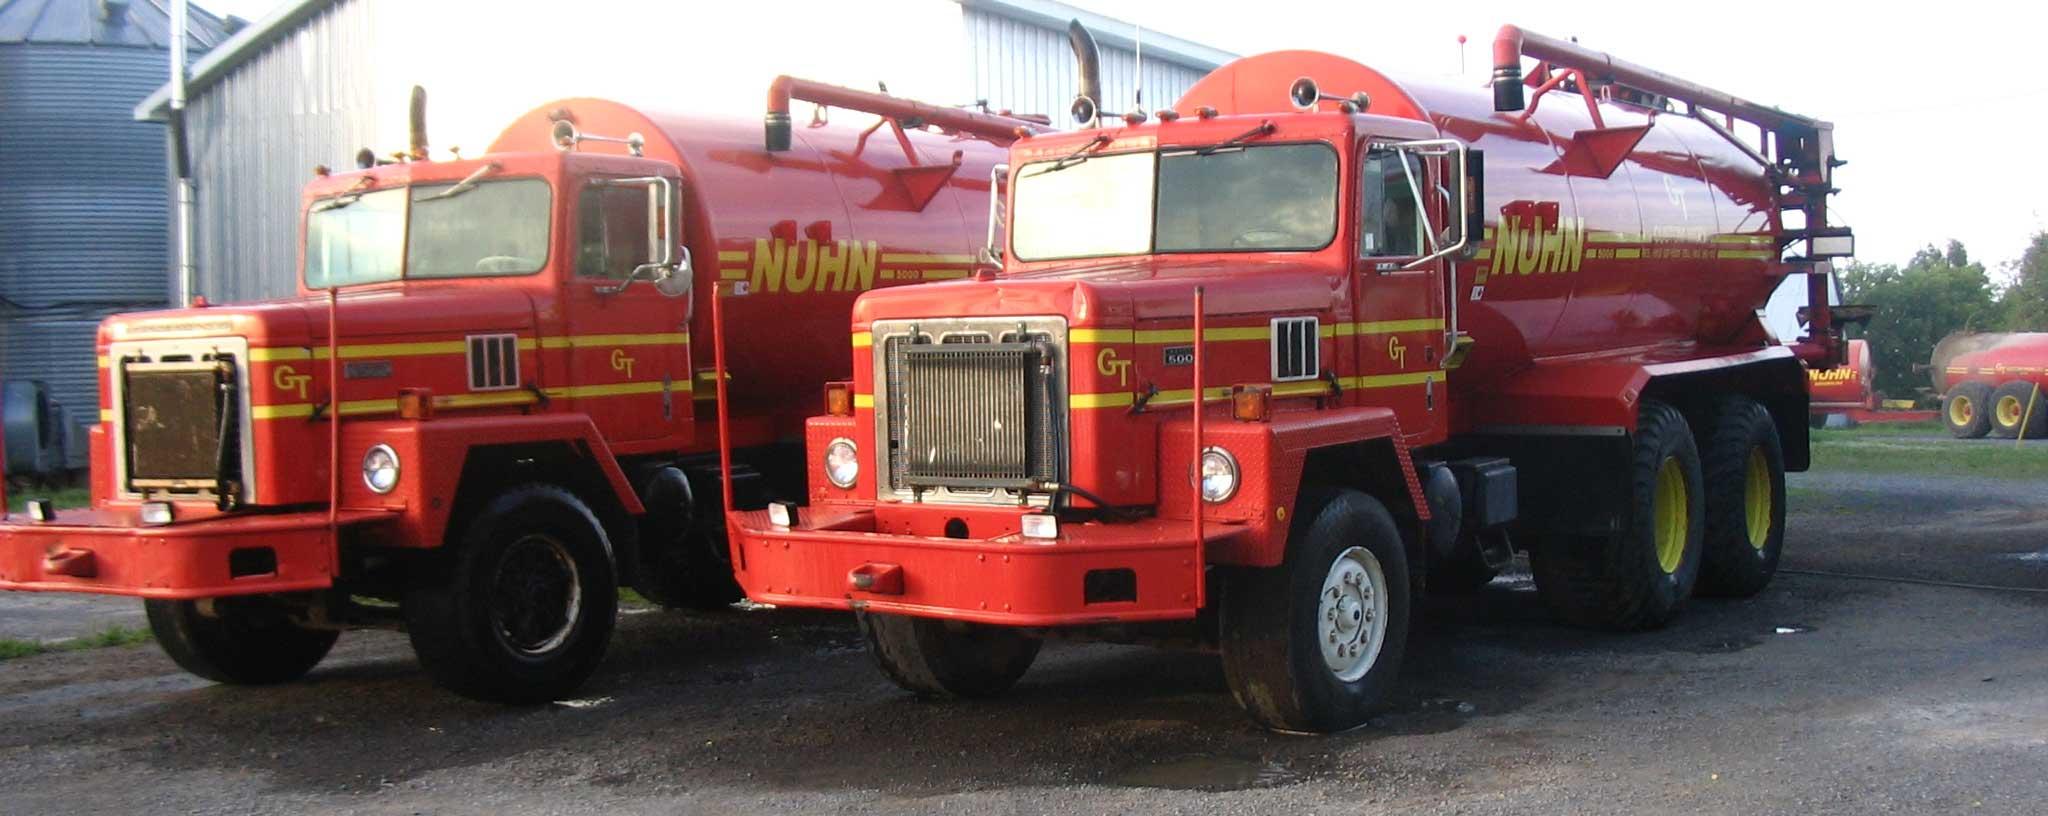 Truck Mount Tank by Nuhn Industries